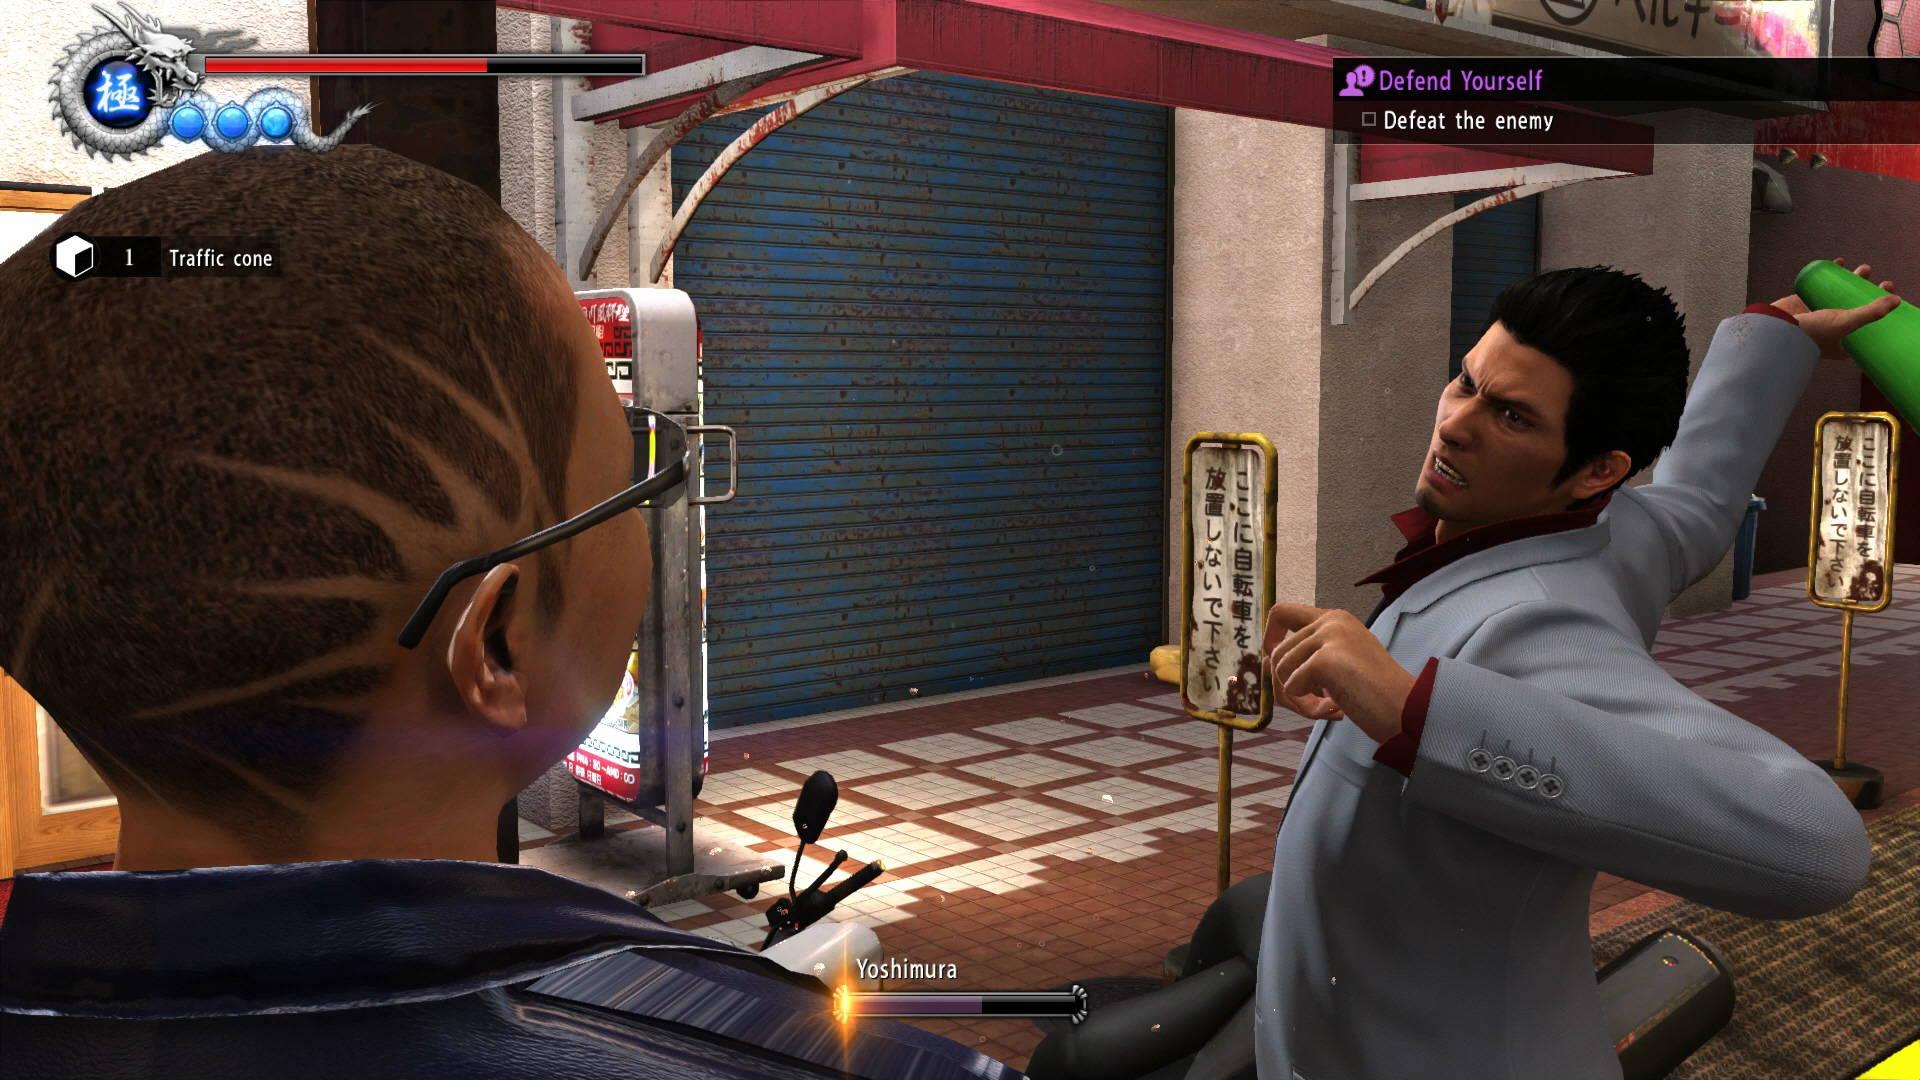 yakuza6thesongoflife_images_0010